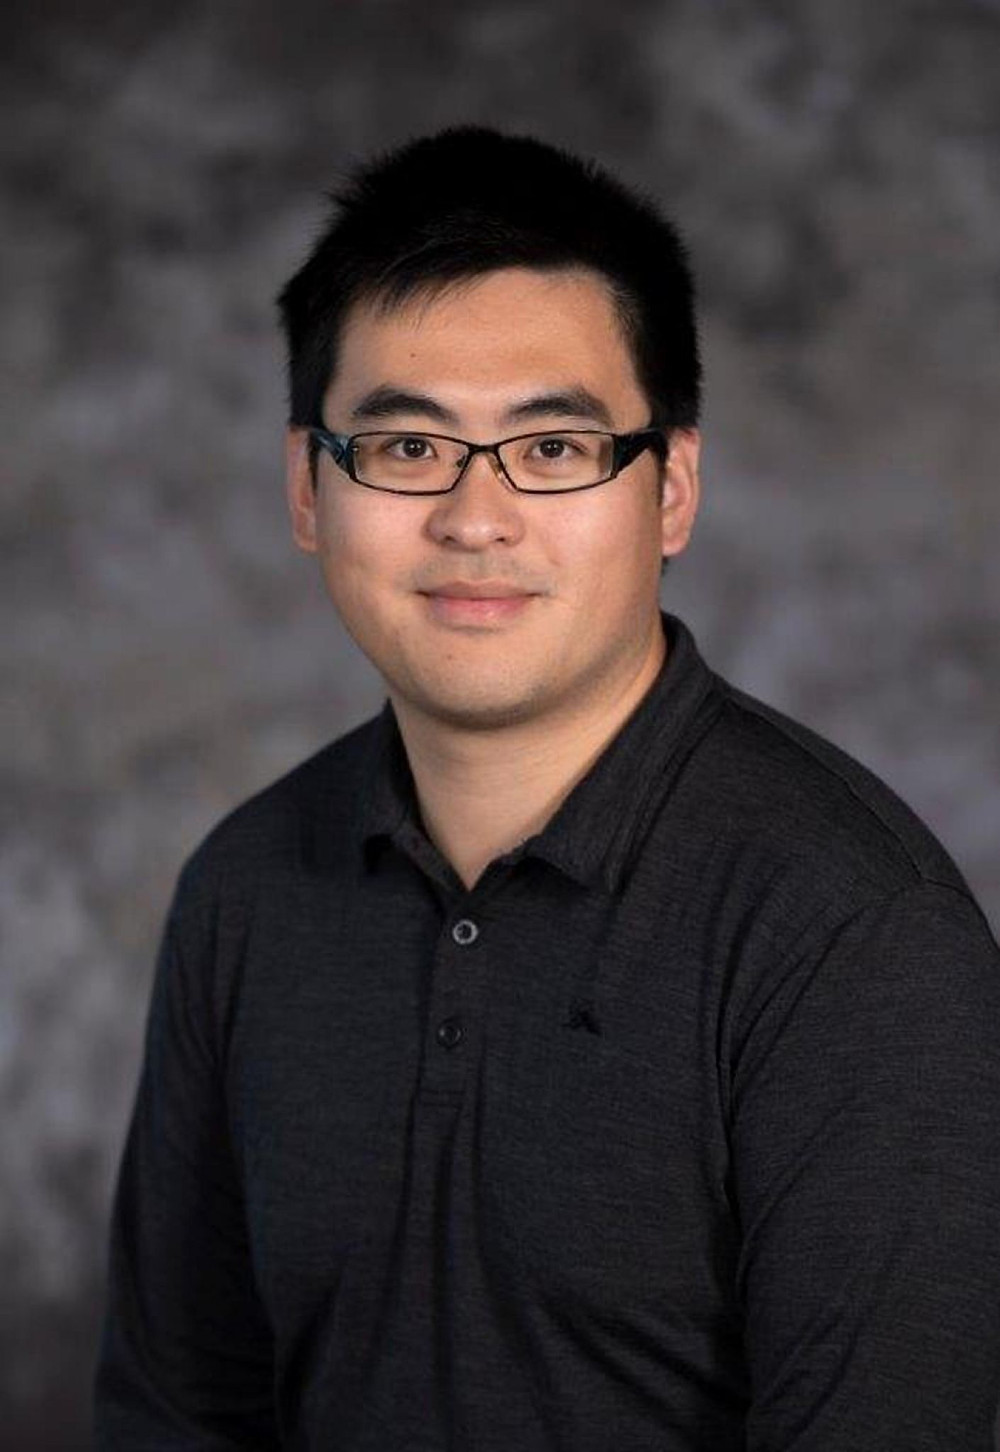 Dr Peter Qiu in a profile photo